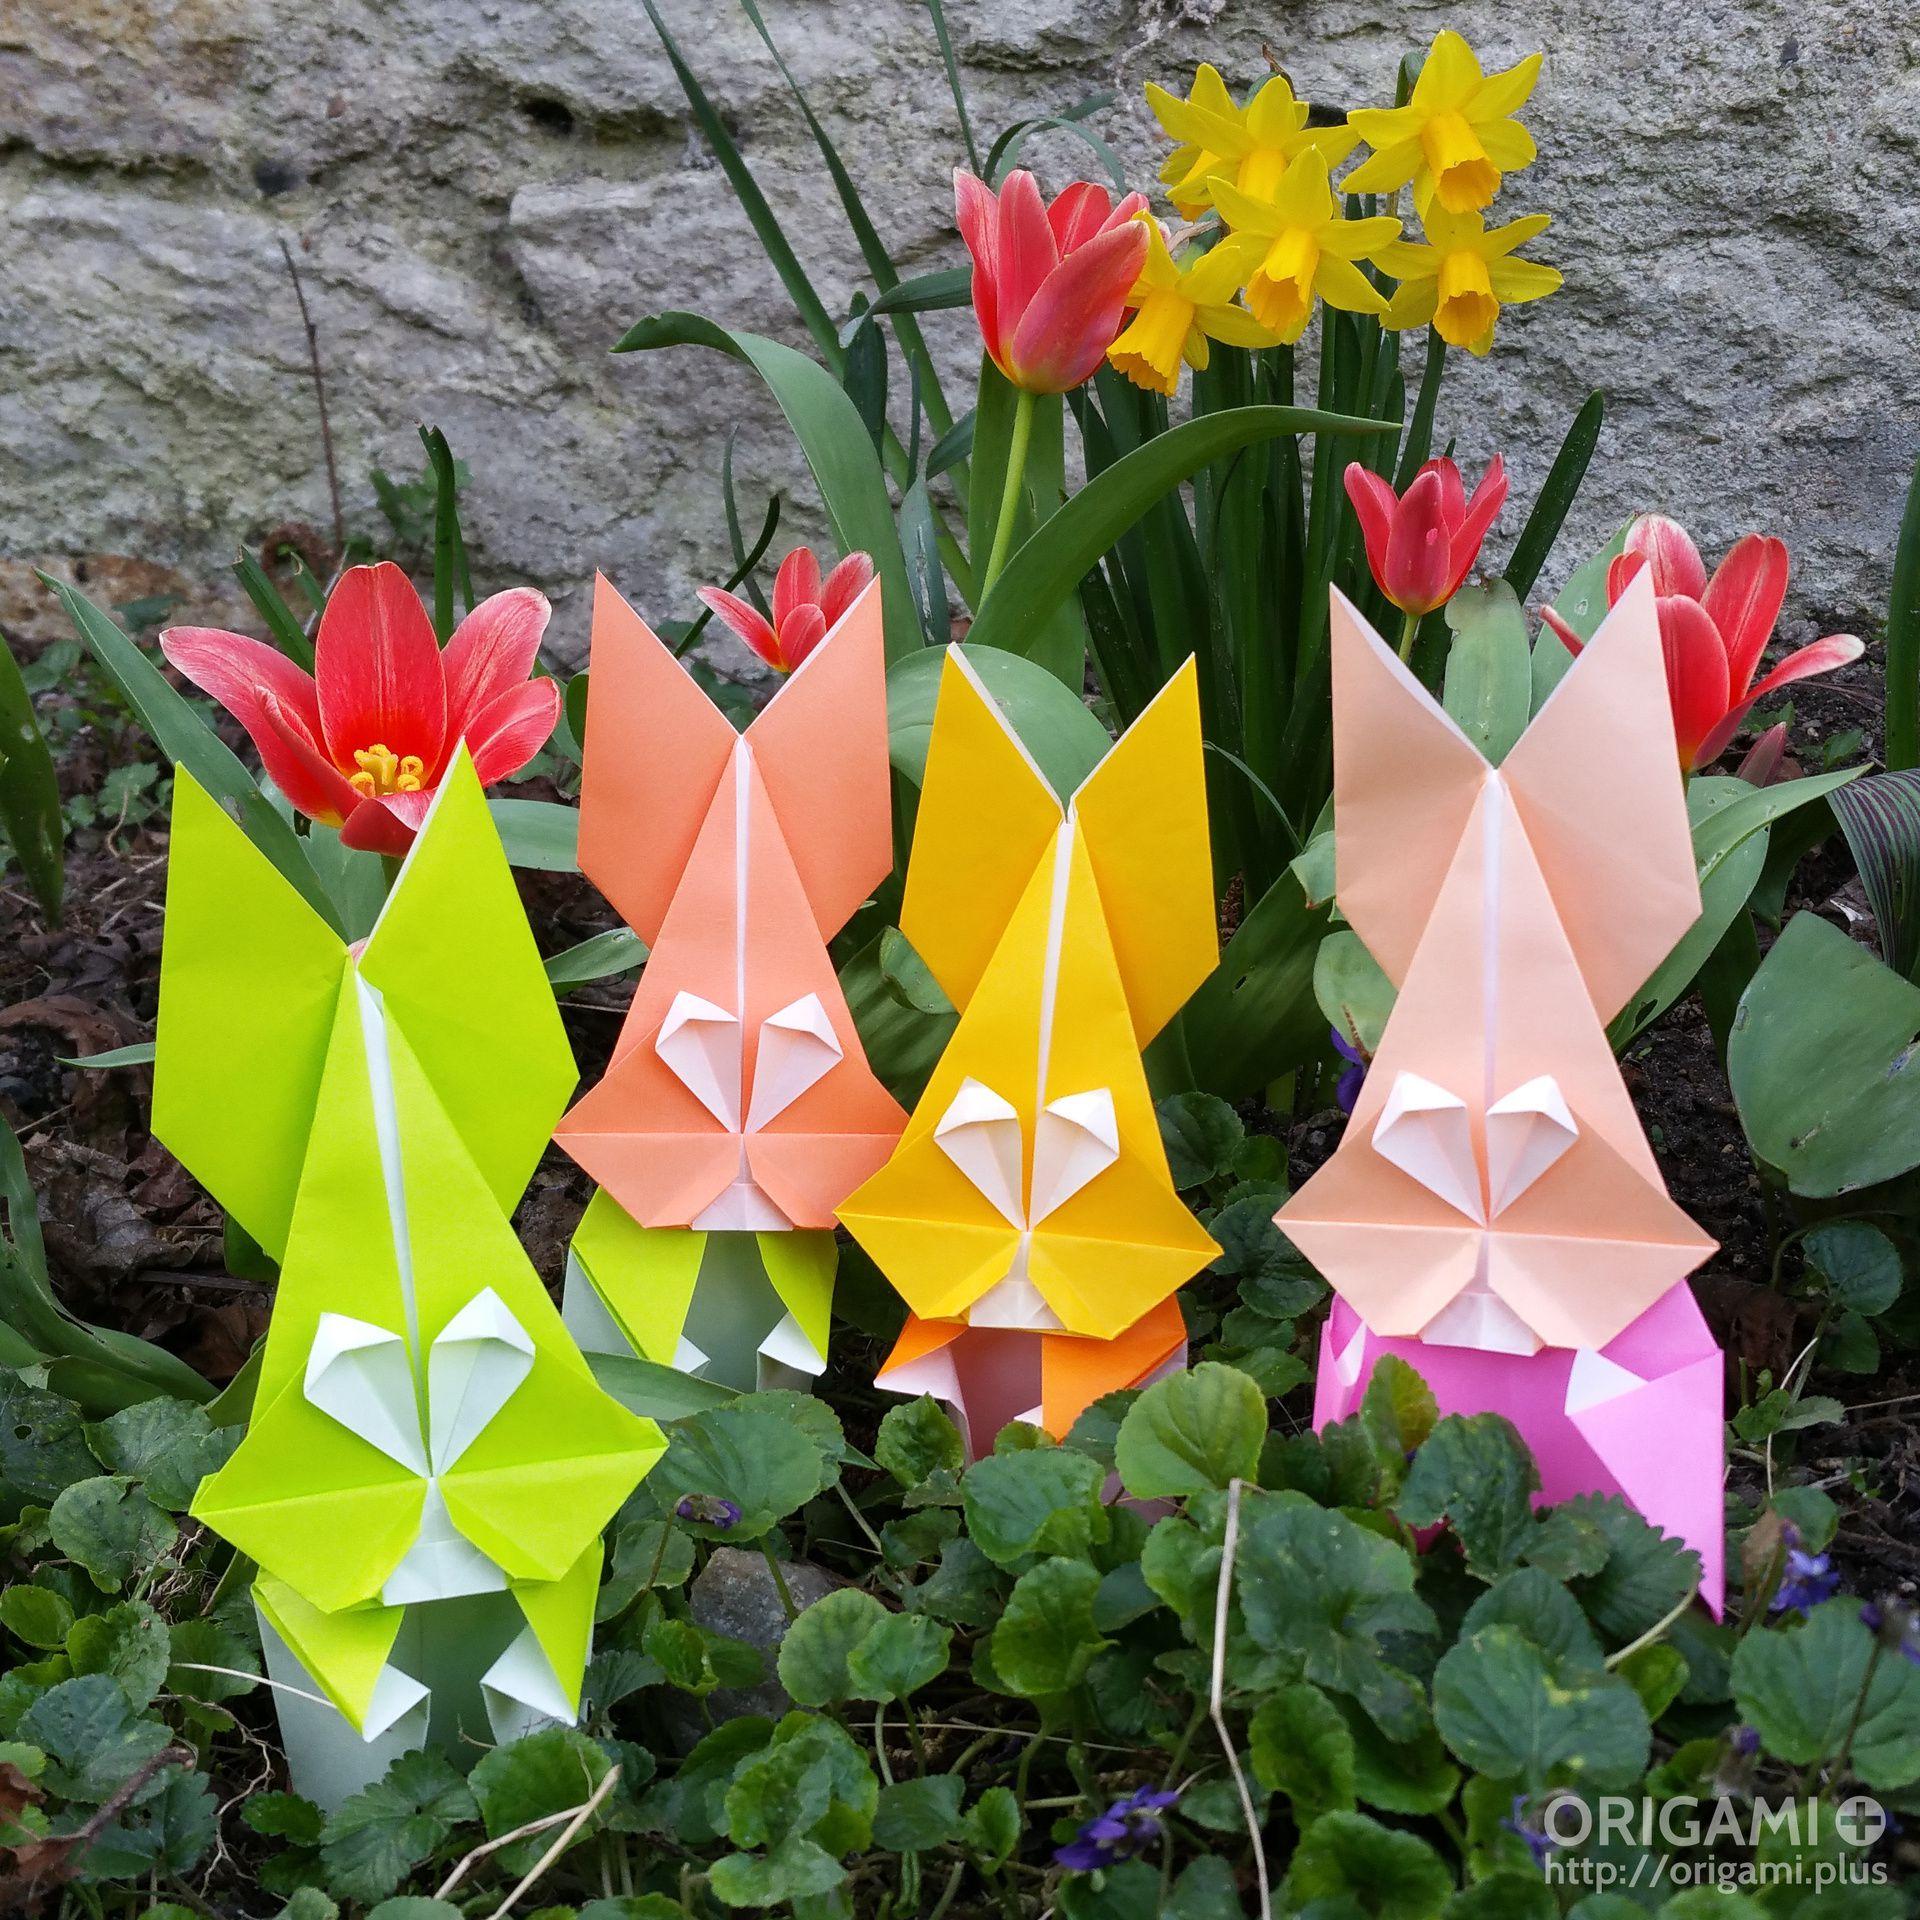 Origami Bunnies in the Garden - photo#32